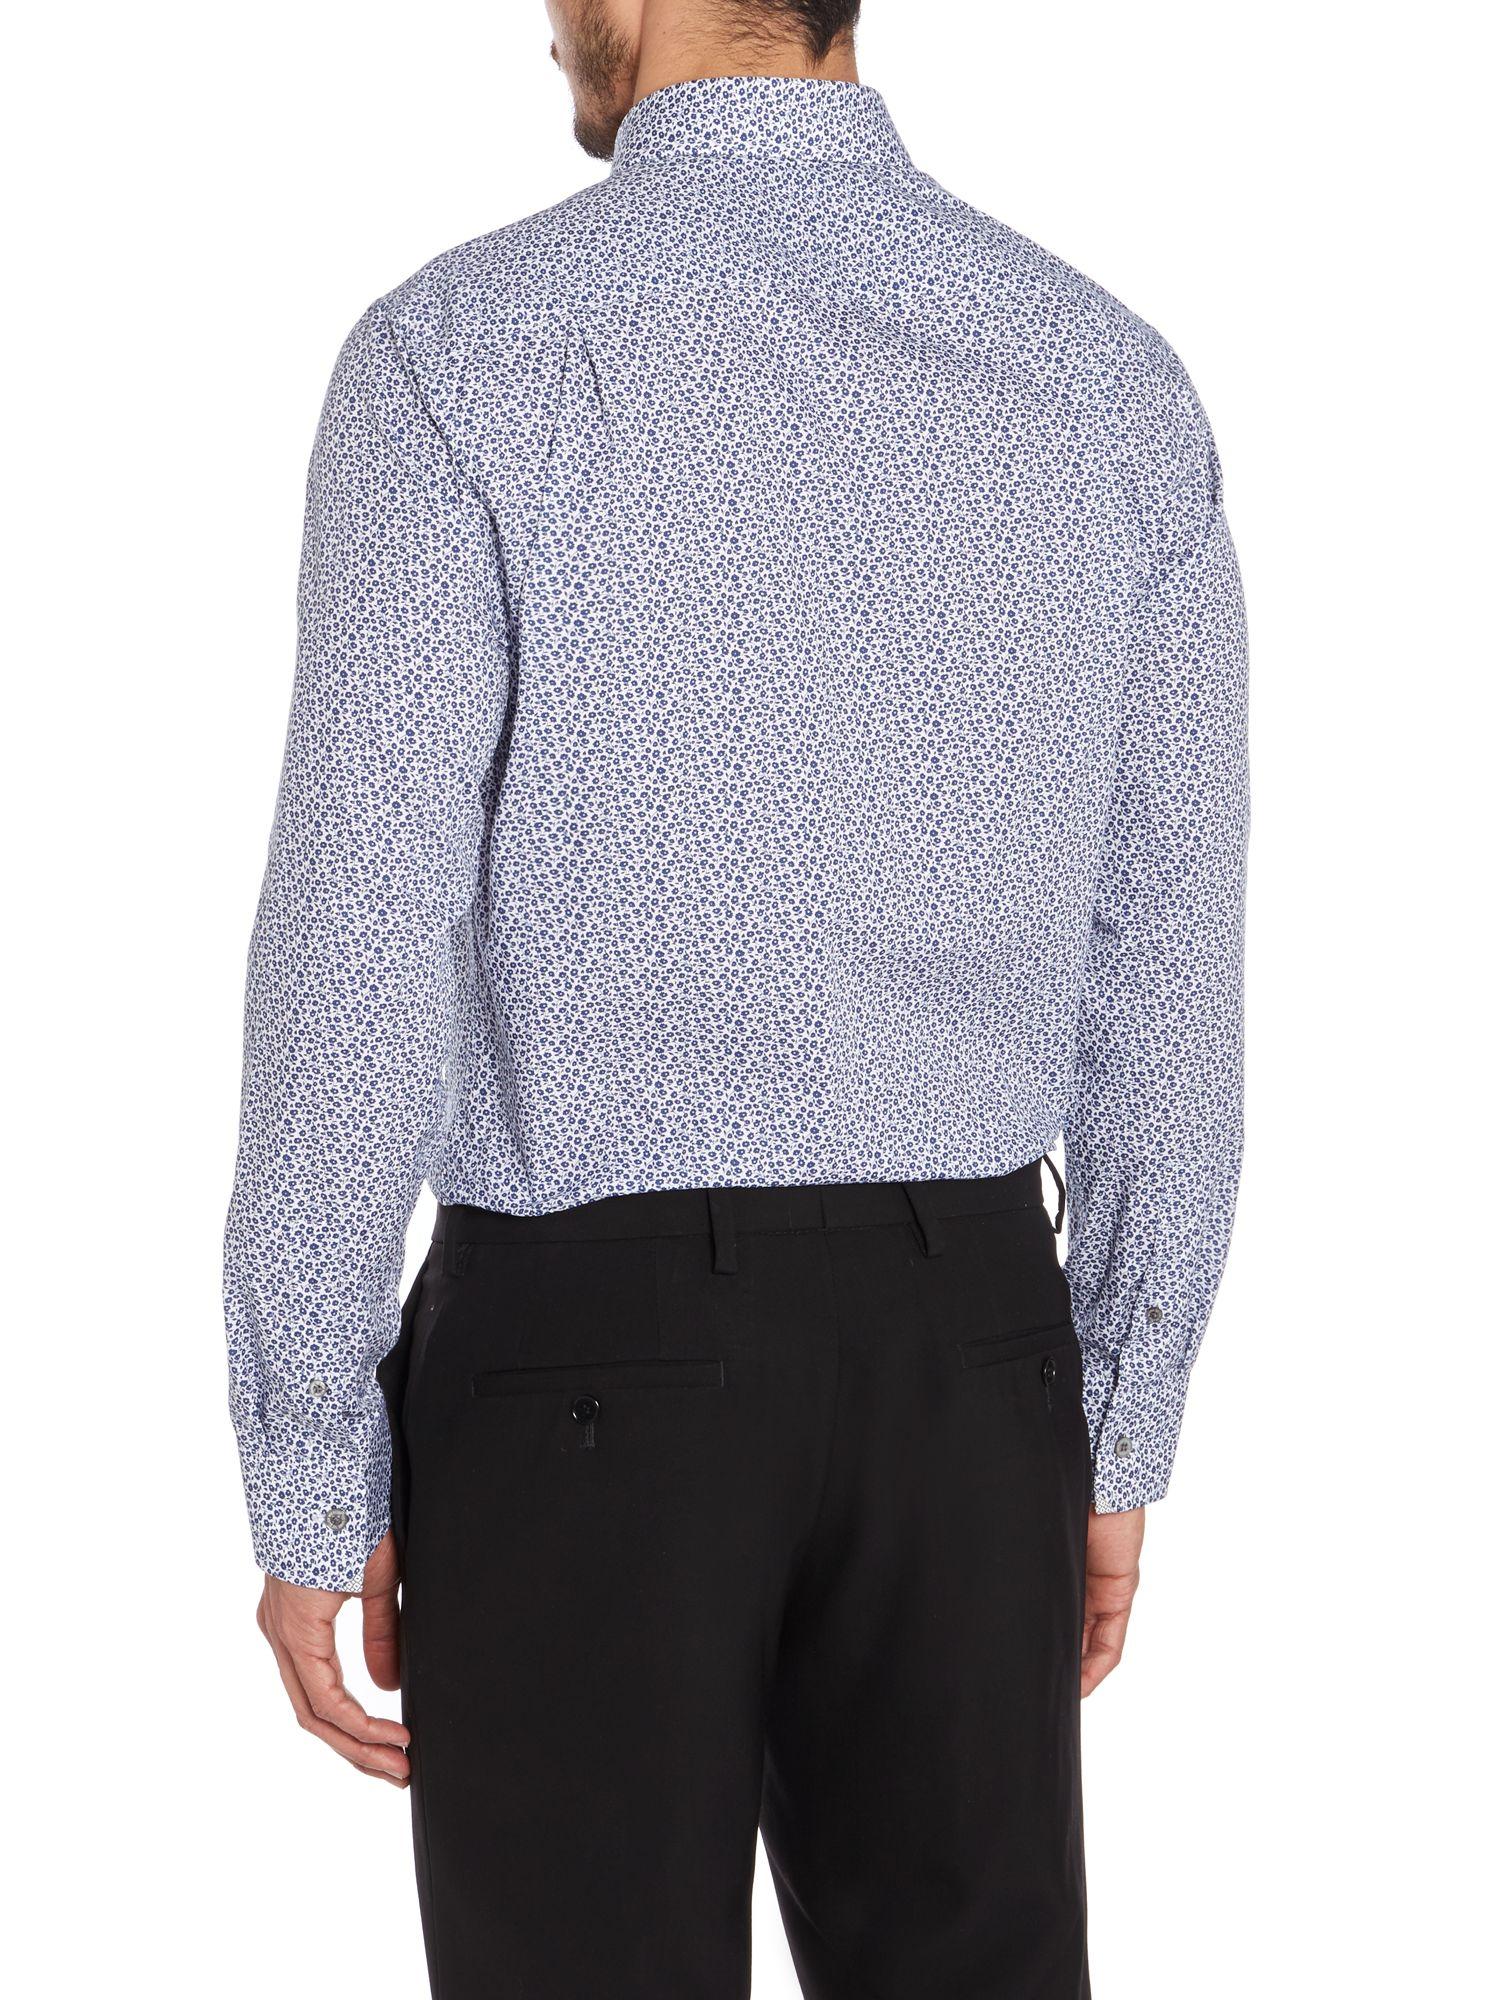 Lyst ted baker thronez regular fit floral shirt in pink for Ted baker floral shirt